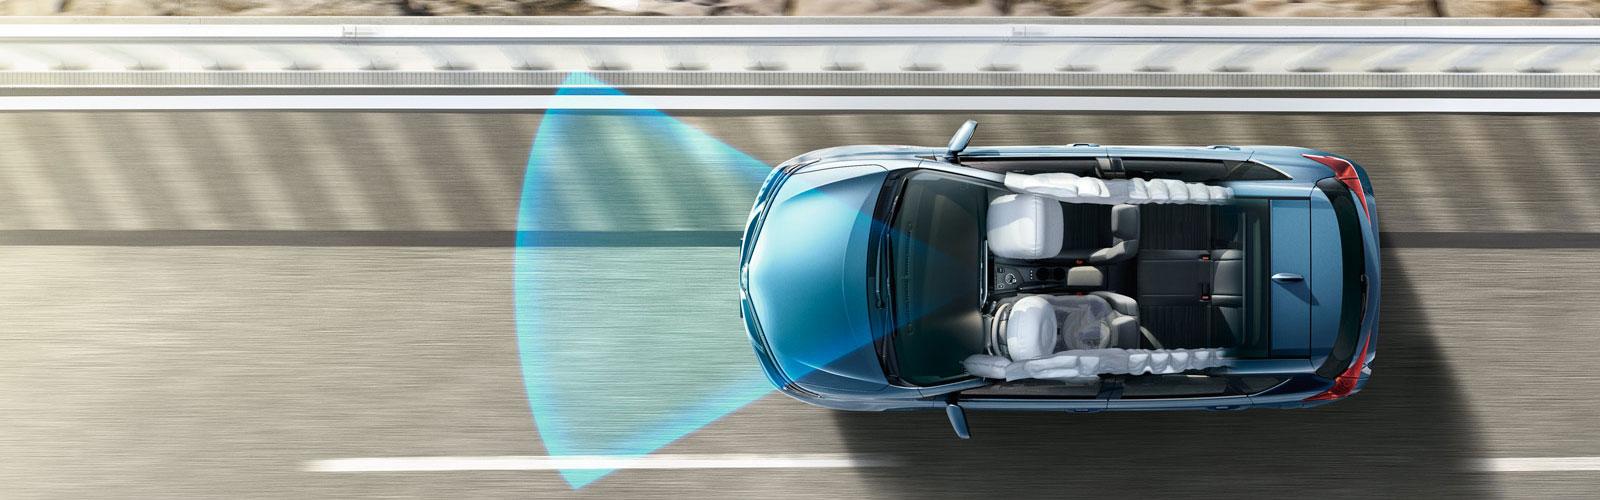 Nuevo sistema Toyota Safety Sense